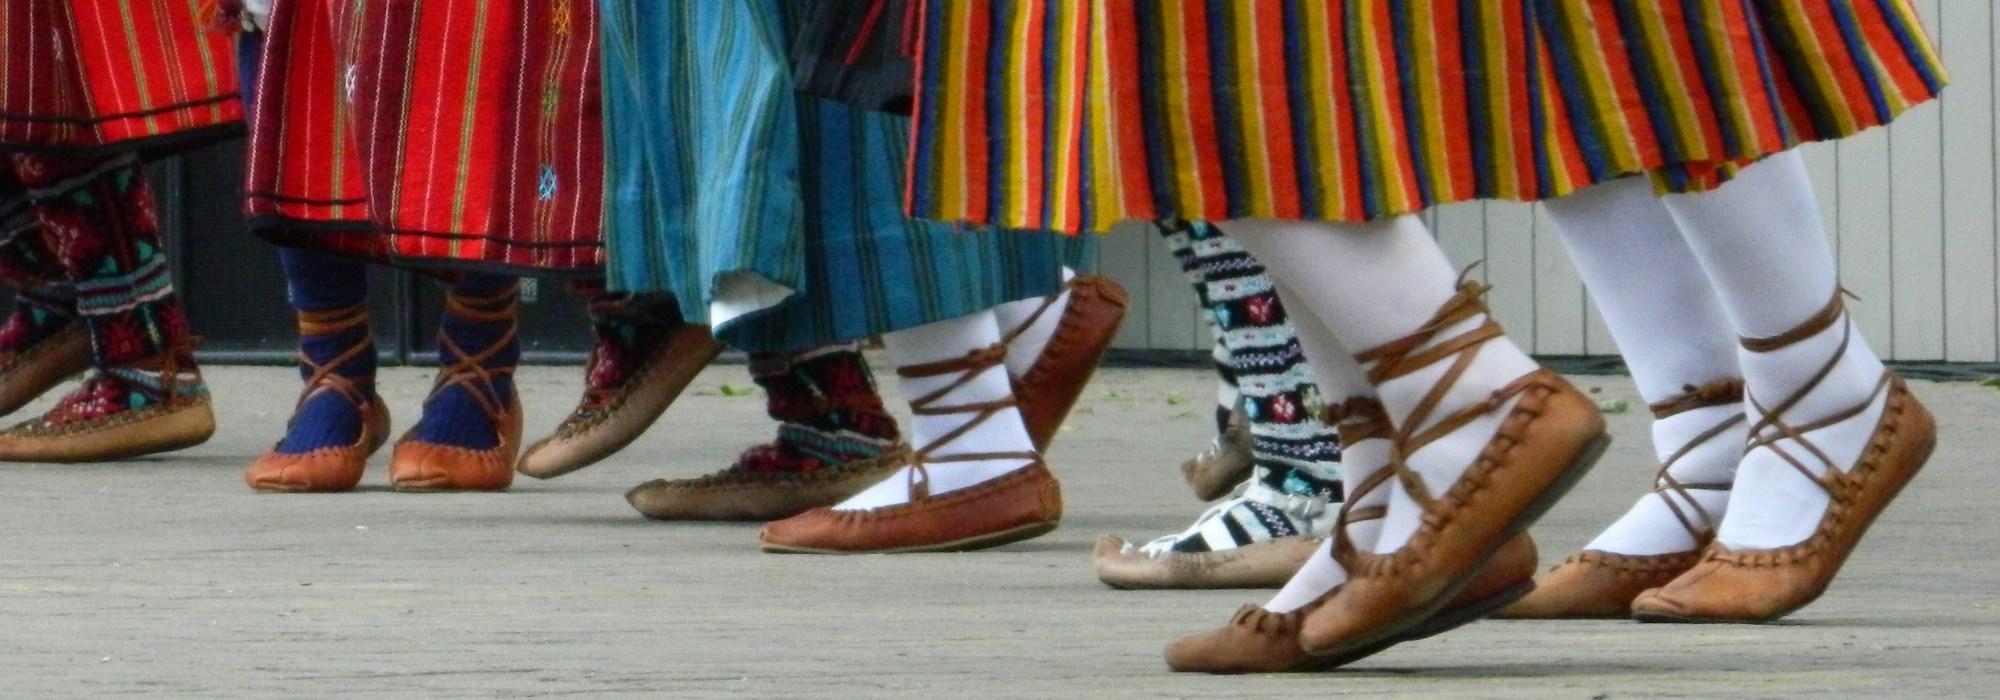 See you @ XXIV Võru Folklore Festival 5-8 July 2018